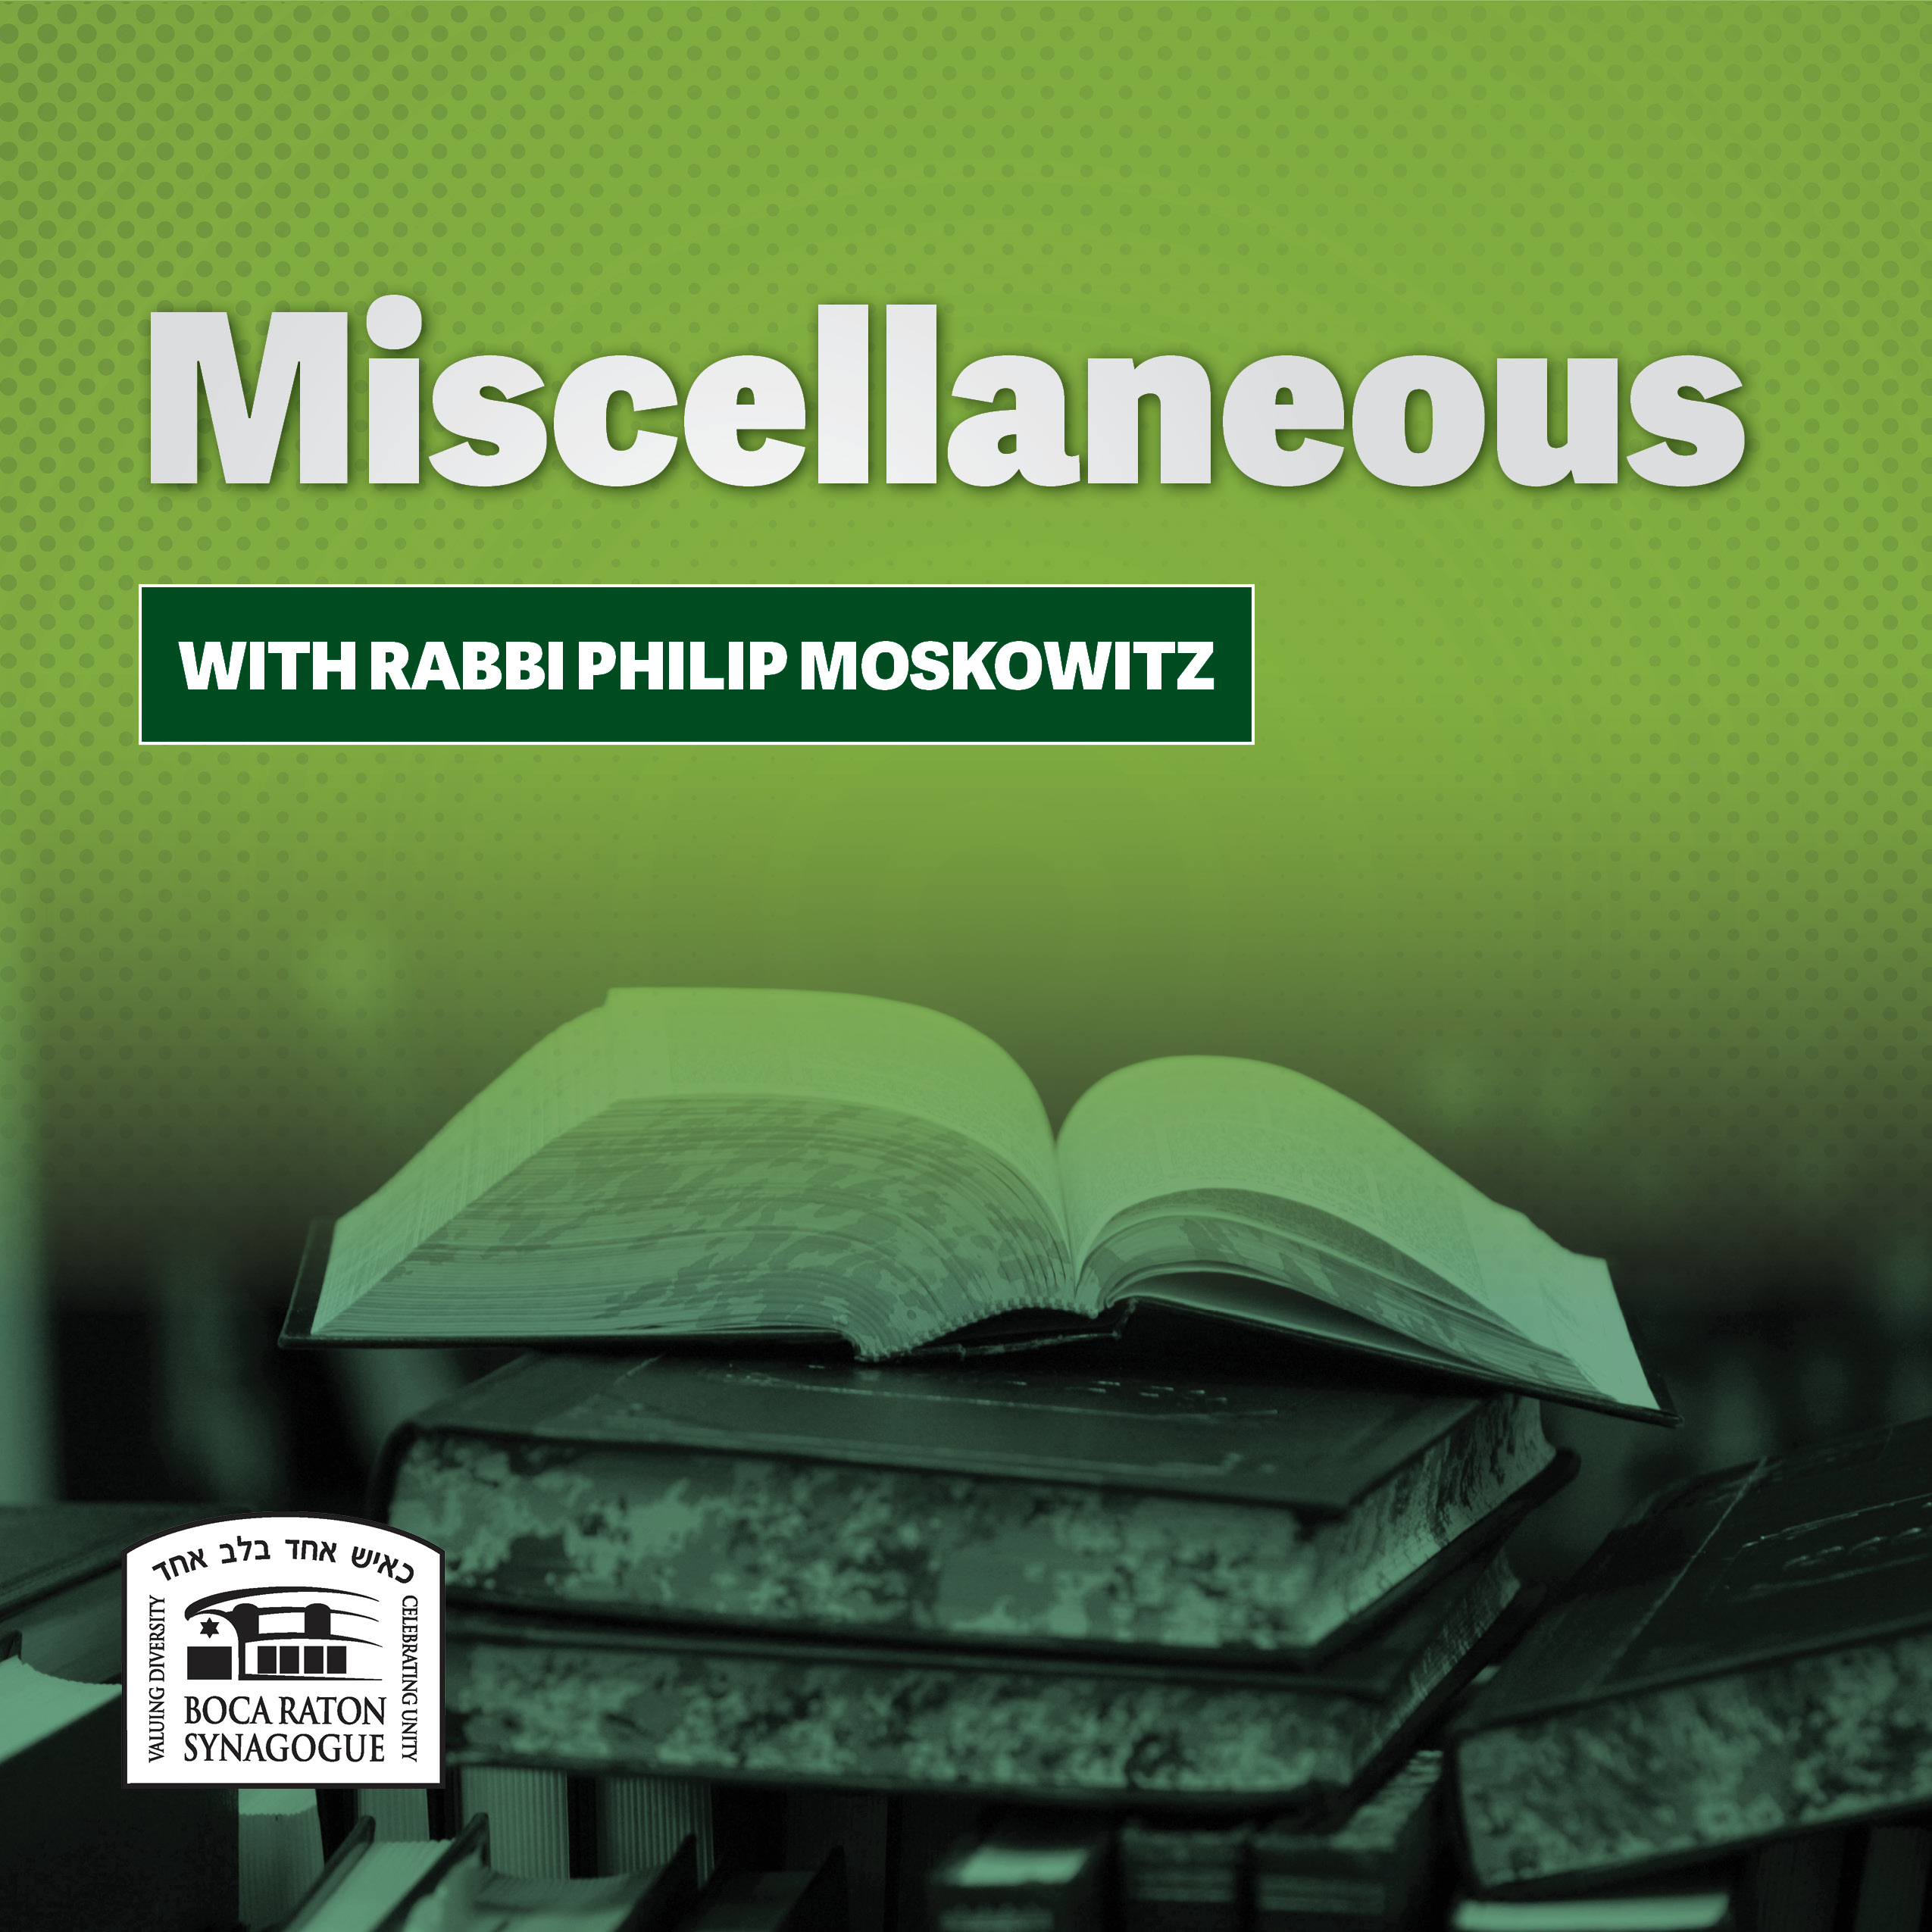 Listen: Miscellaneous